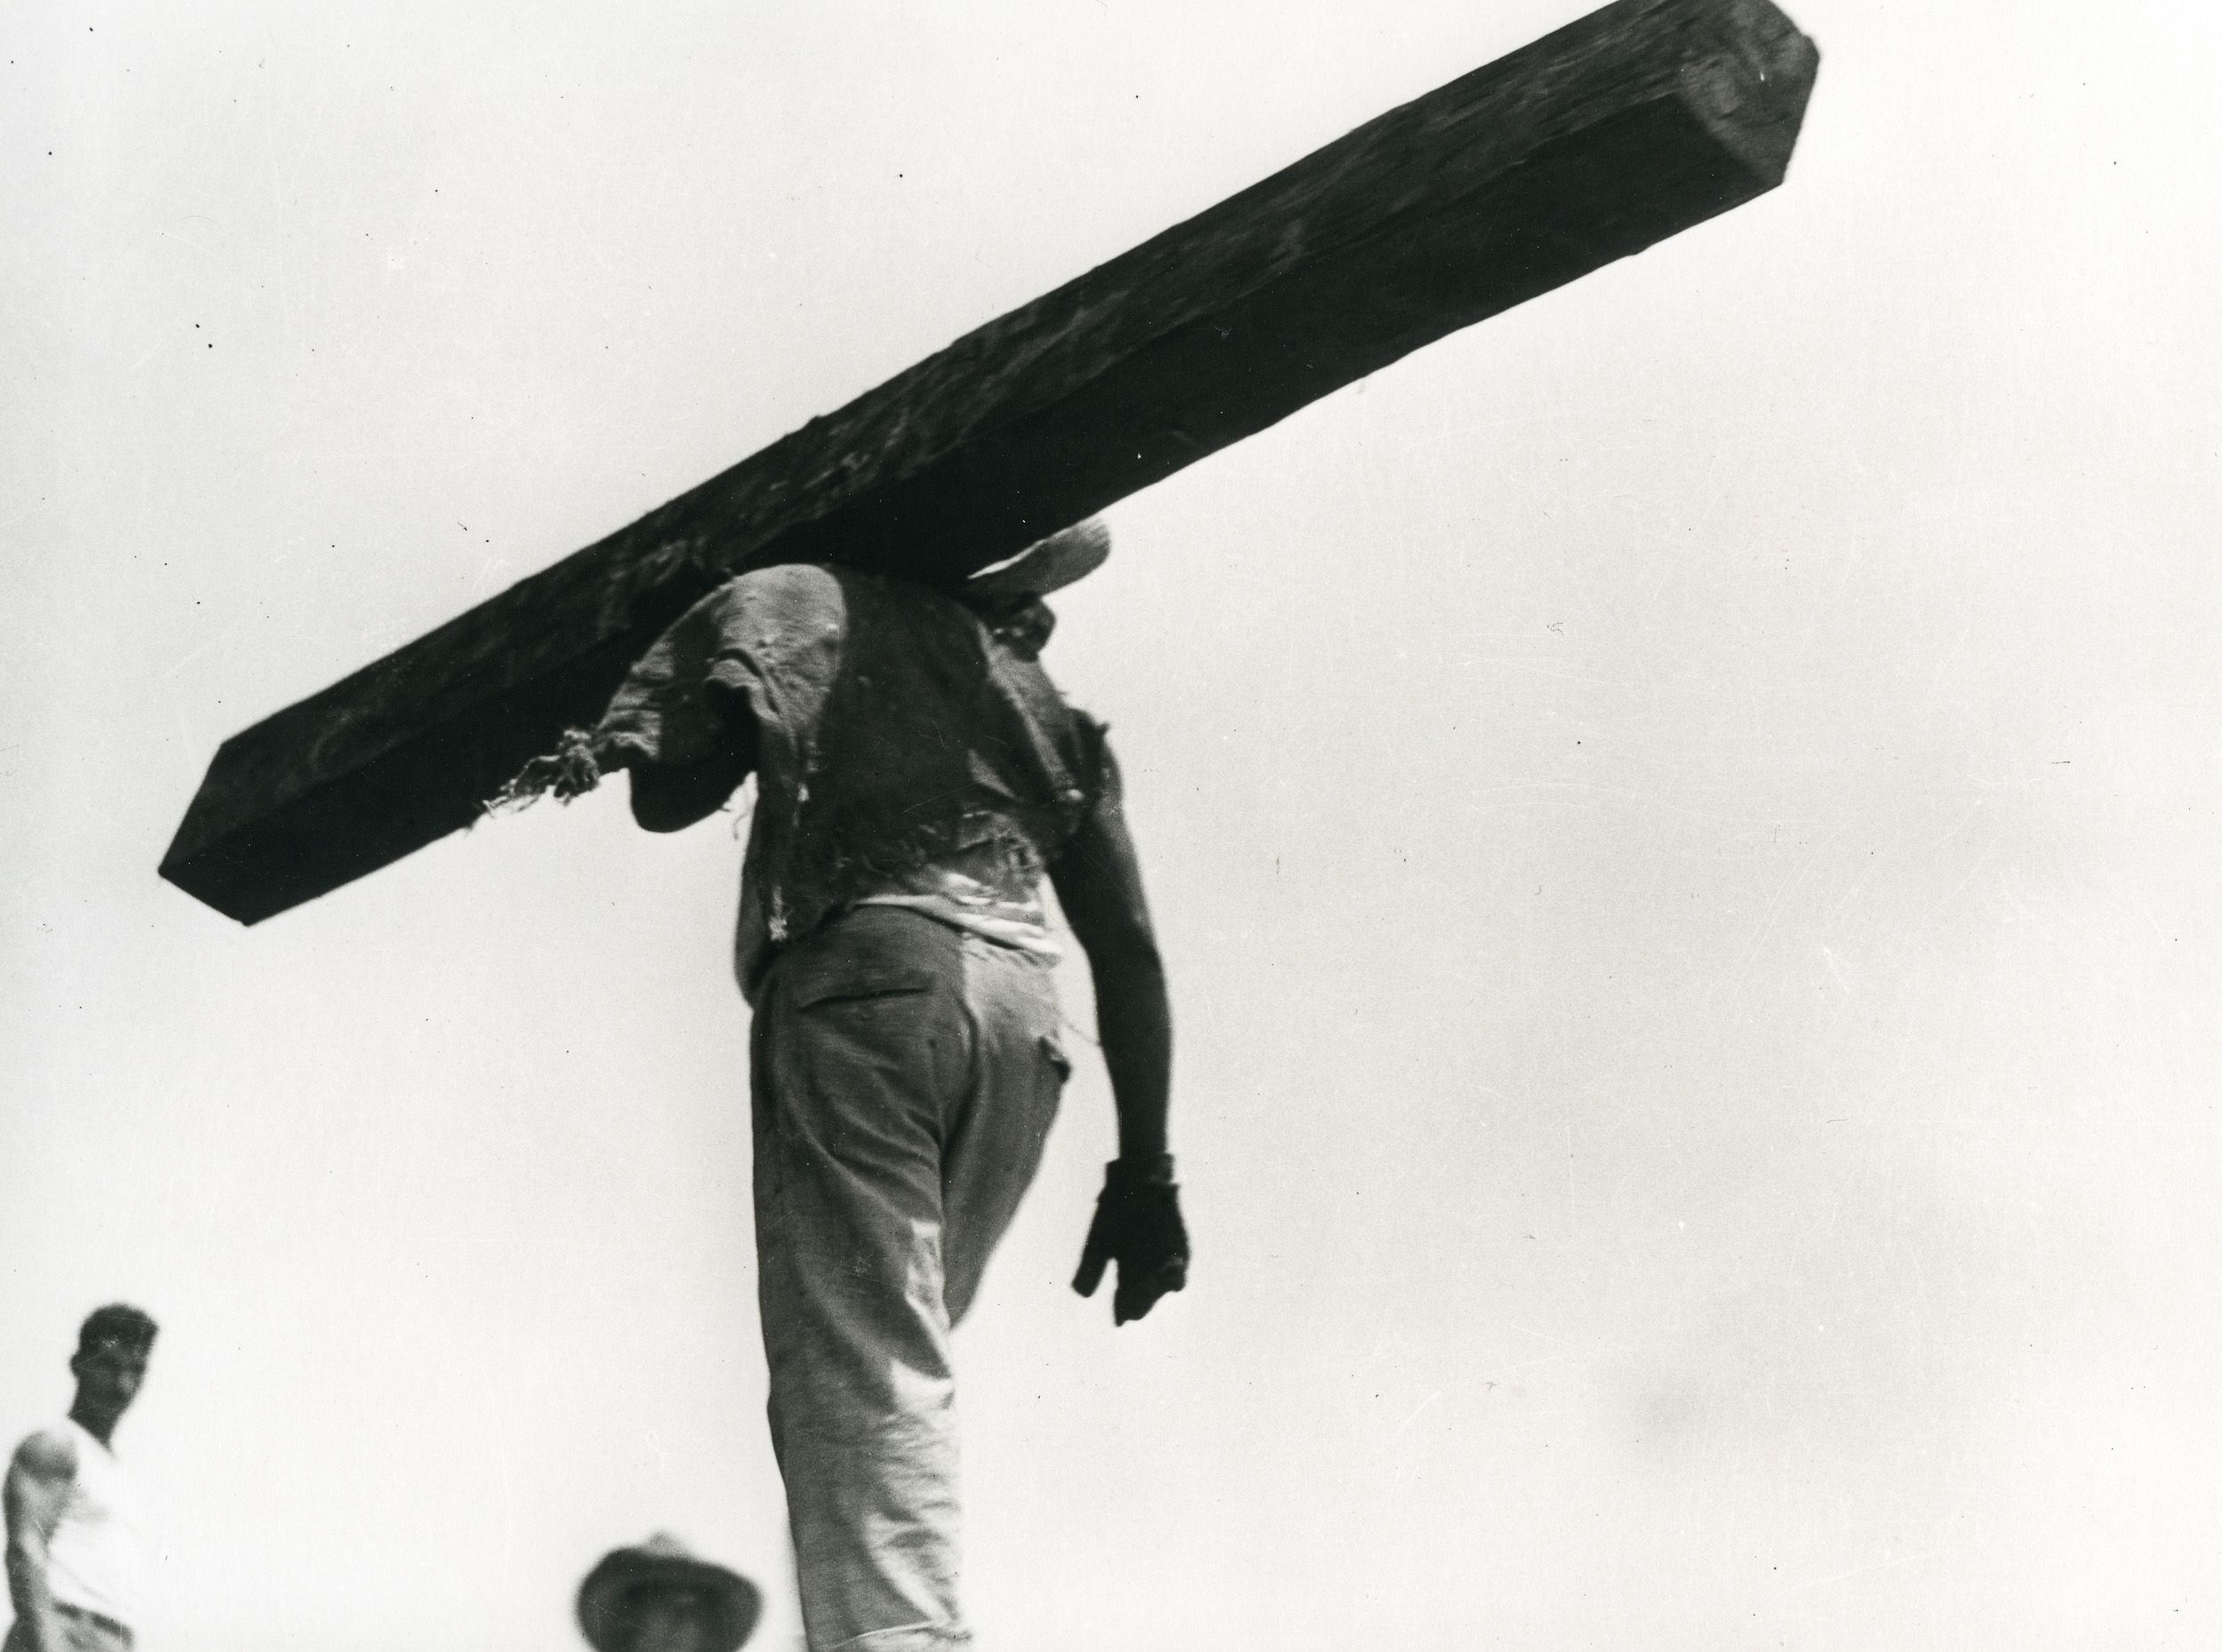 Ouvrier, Tina Modotti, 1920